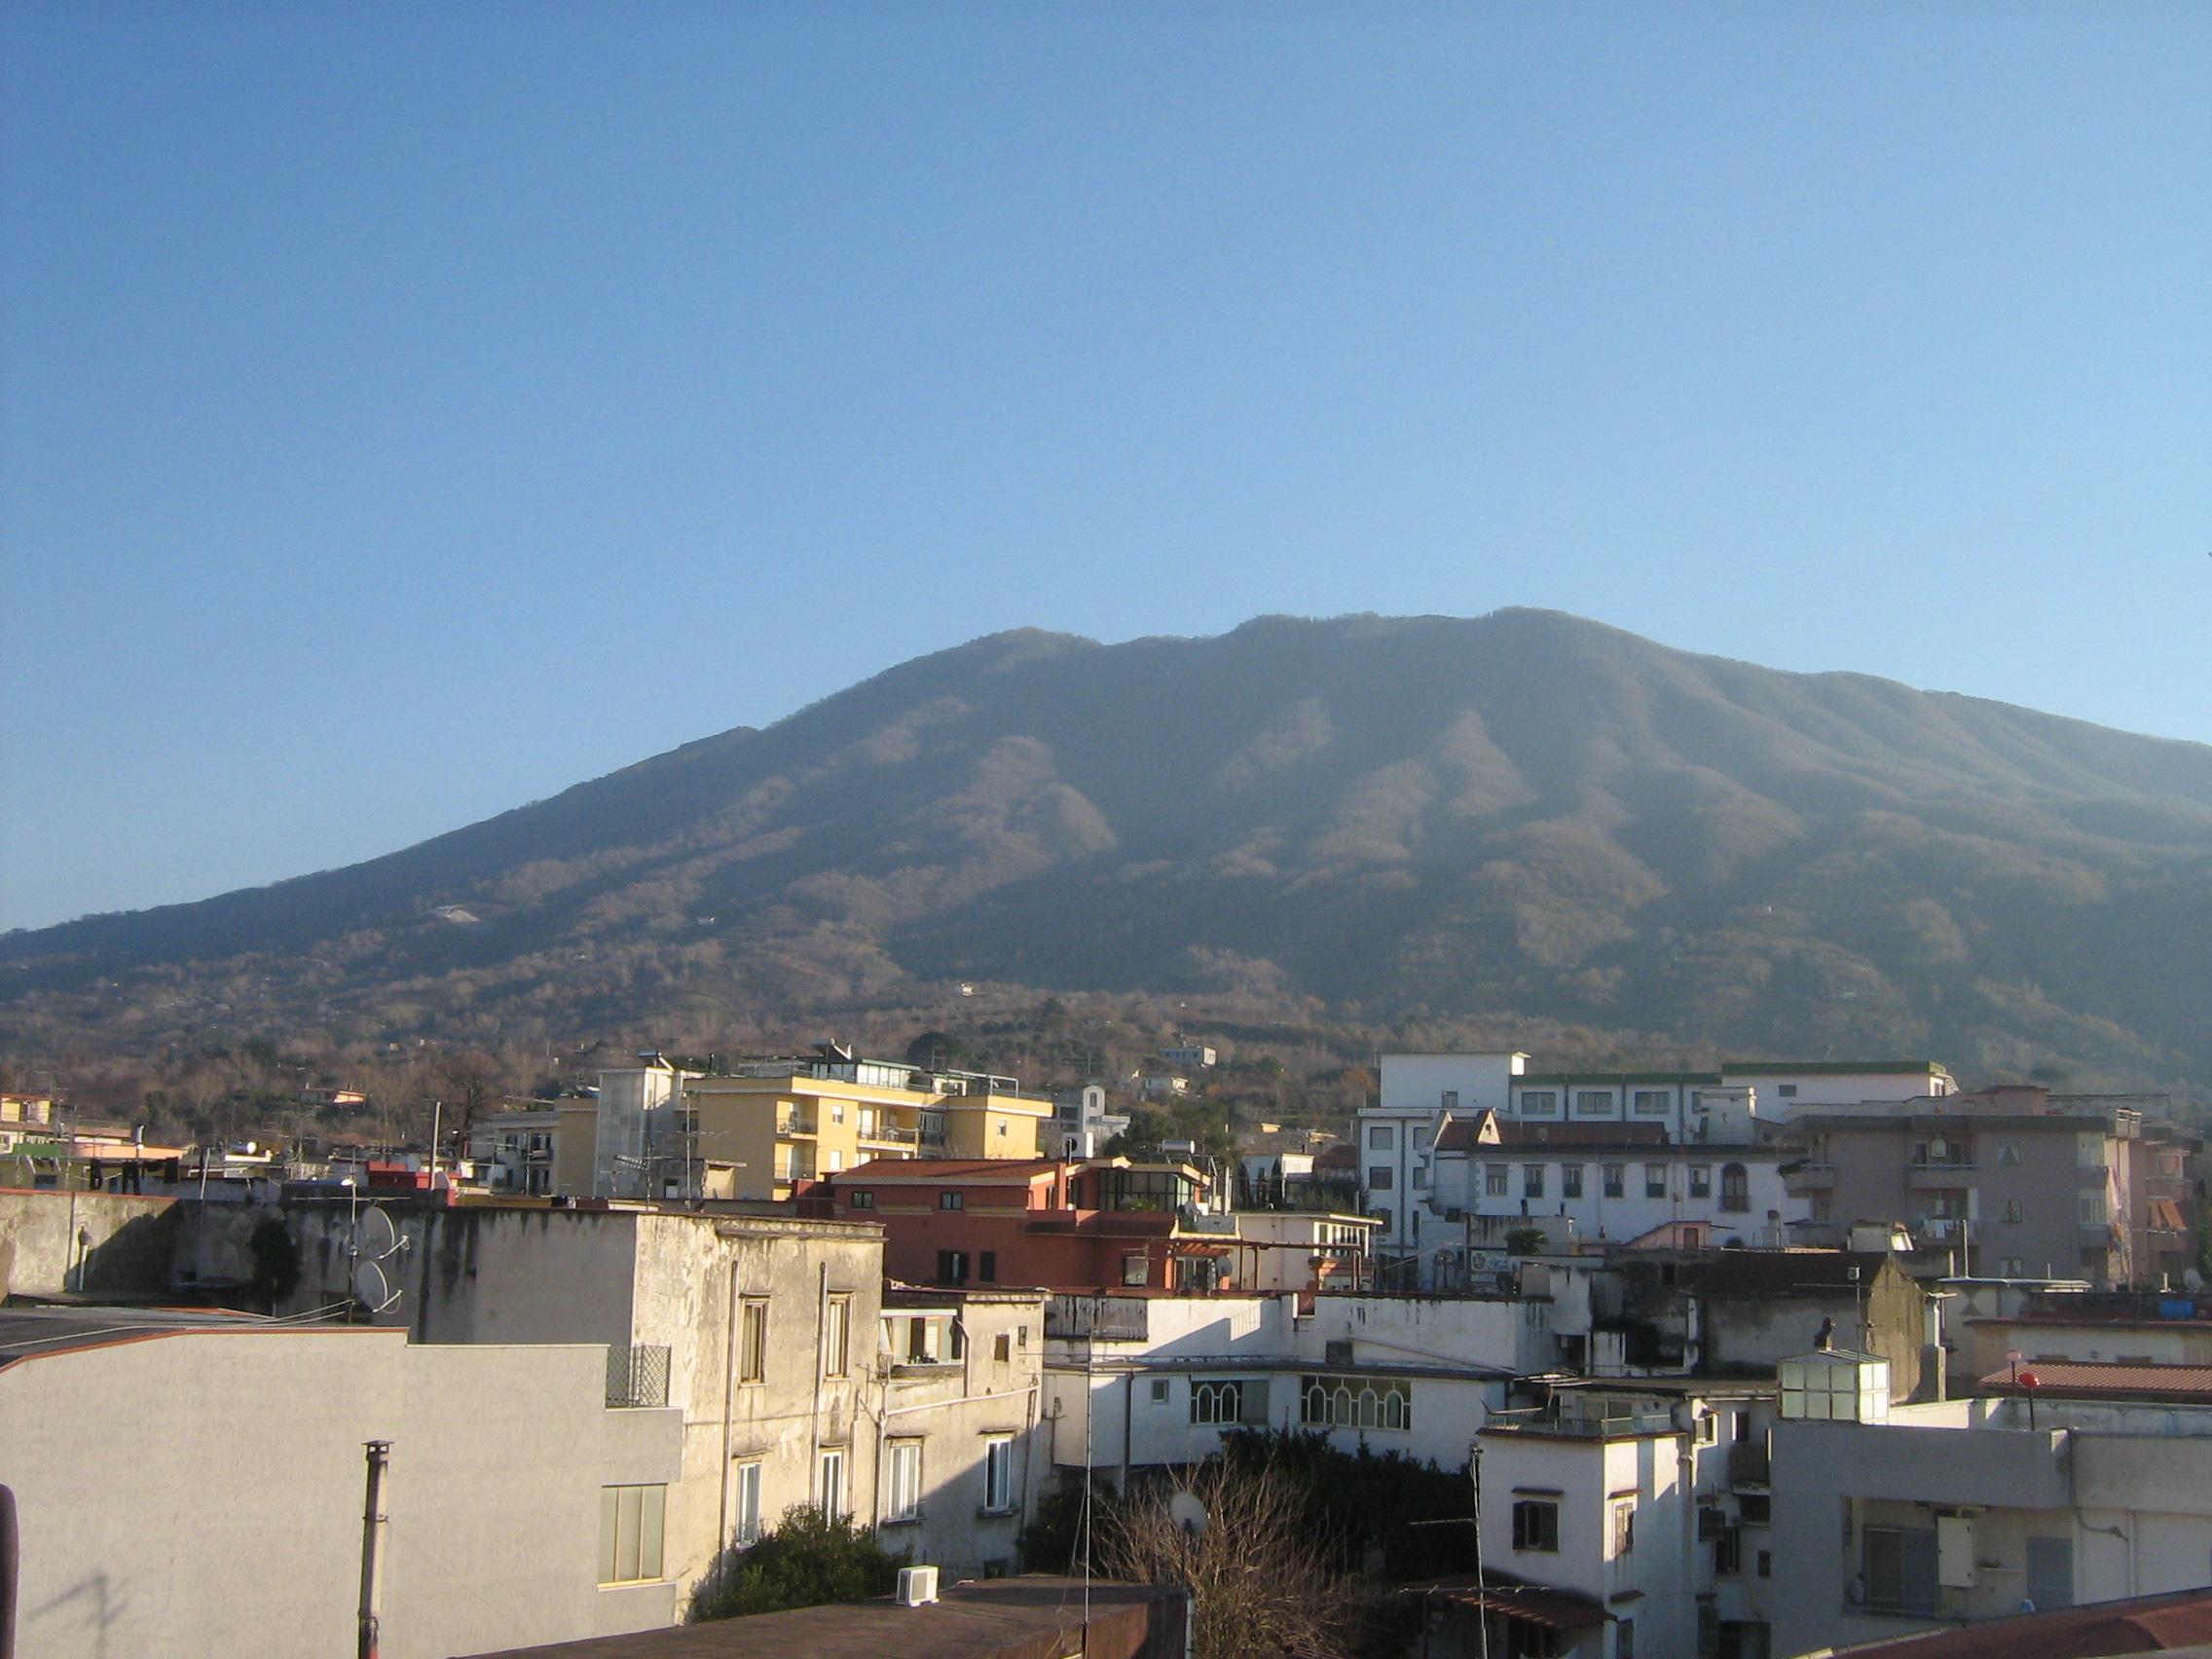 Via Romani Pomigliano D Arco sant'anastasia - wikipedia